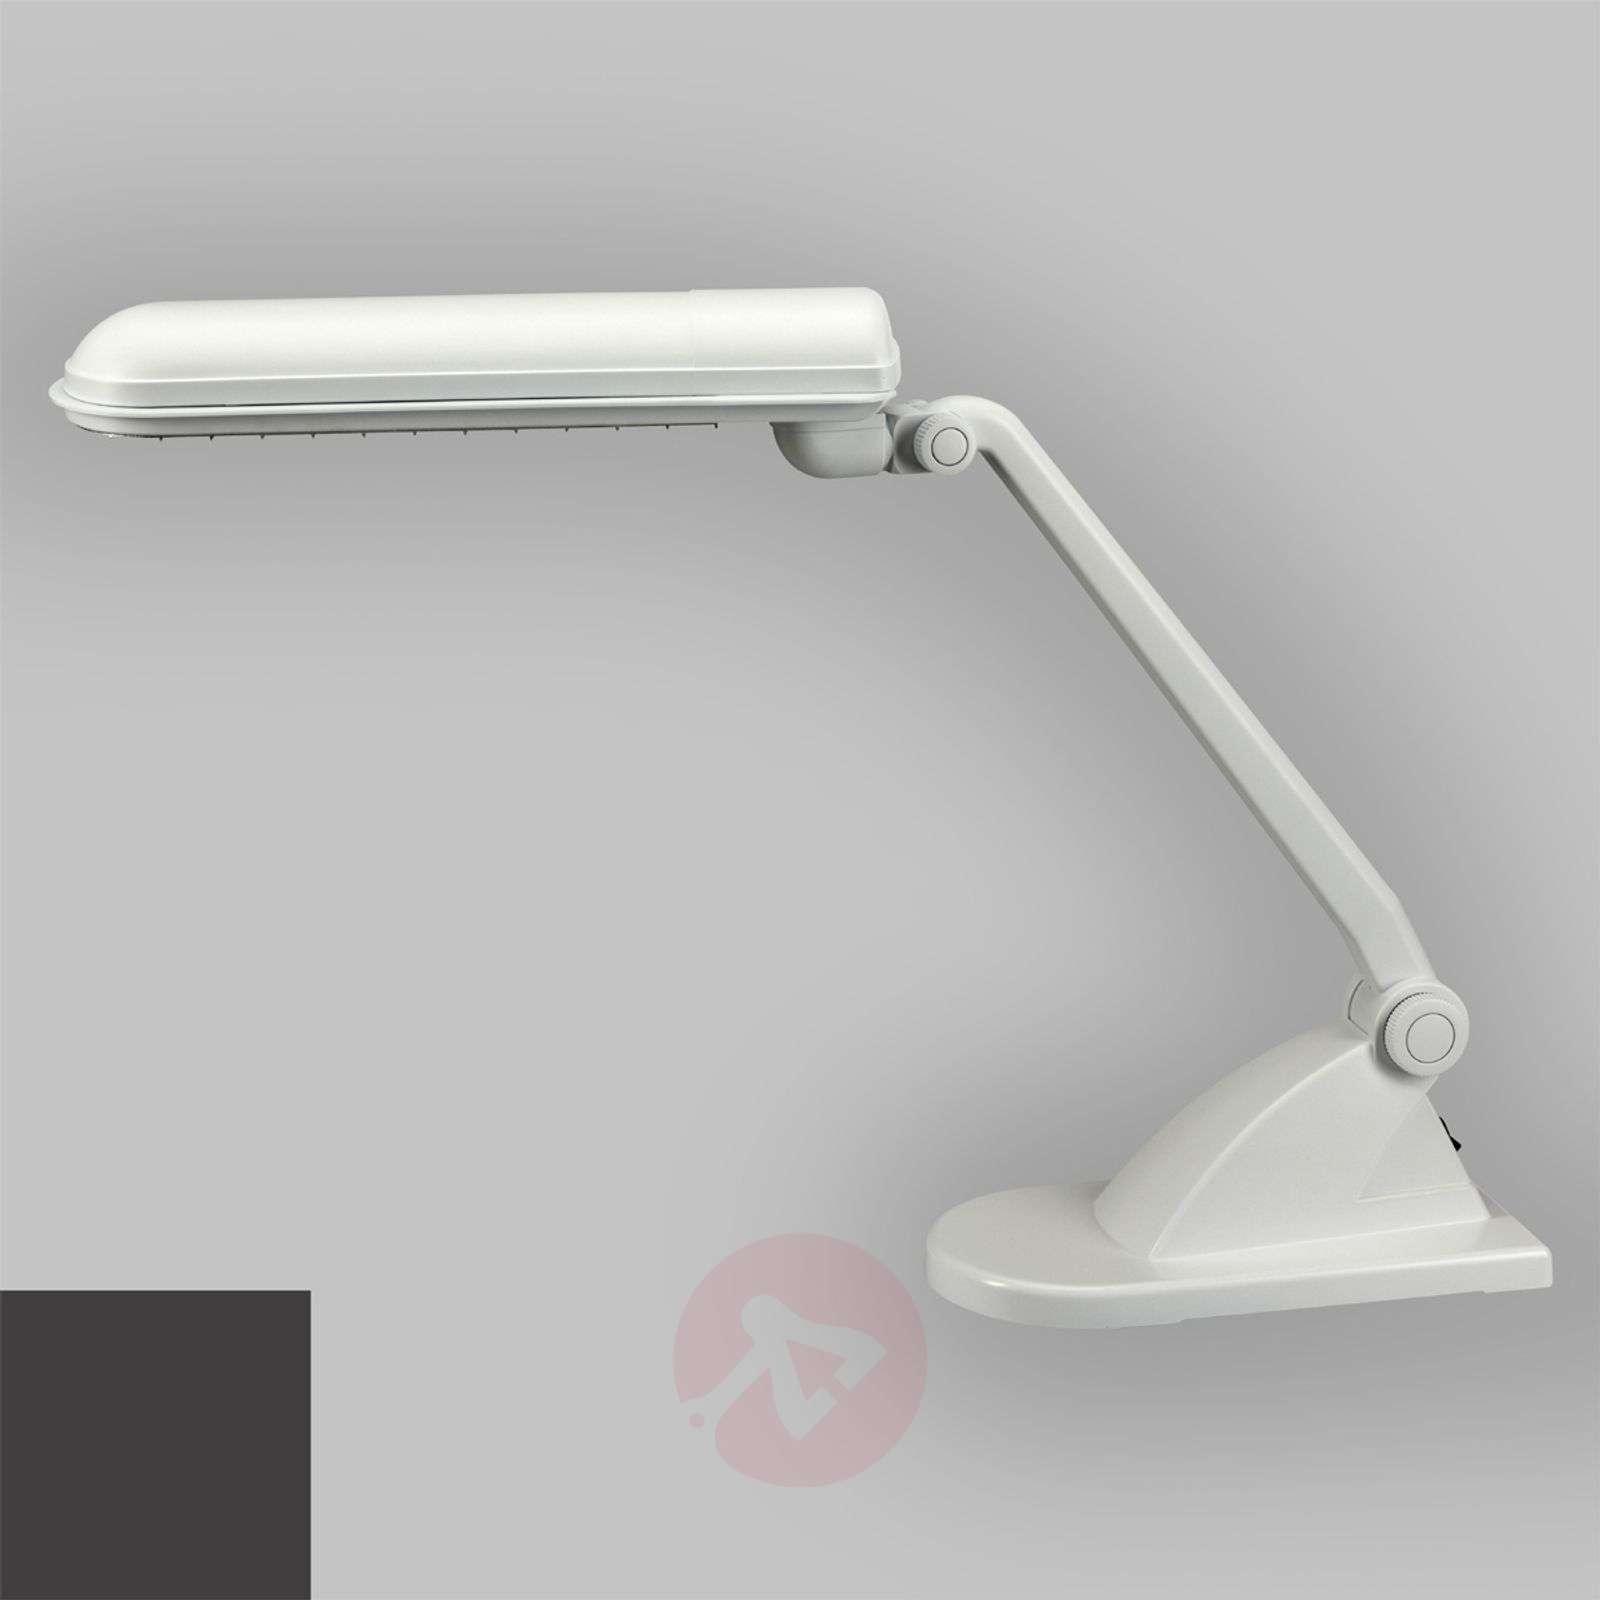 Glare free workplace light Orleander-1003101X-01